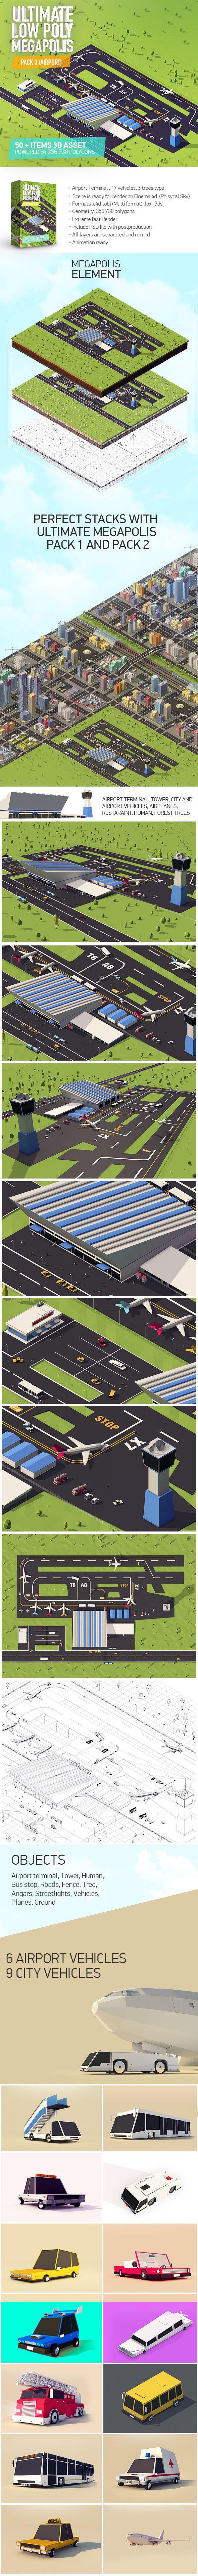 Ultimate Megapolis Pack 3 (Airport) 3D Models Design Template #cinema4d #3D #3dDesign Download here: https://3docean.net/item/ultimate-megapolis-pack-3-airport/18467482?ref=yinkira